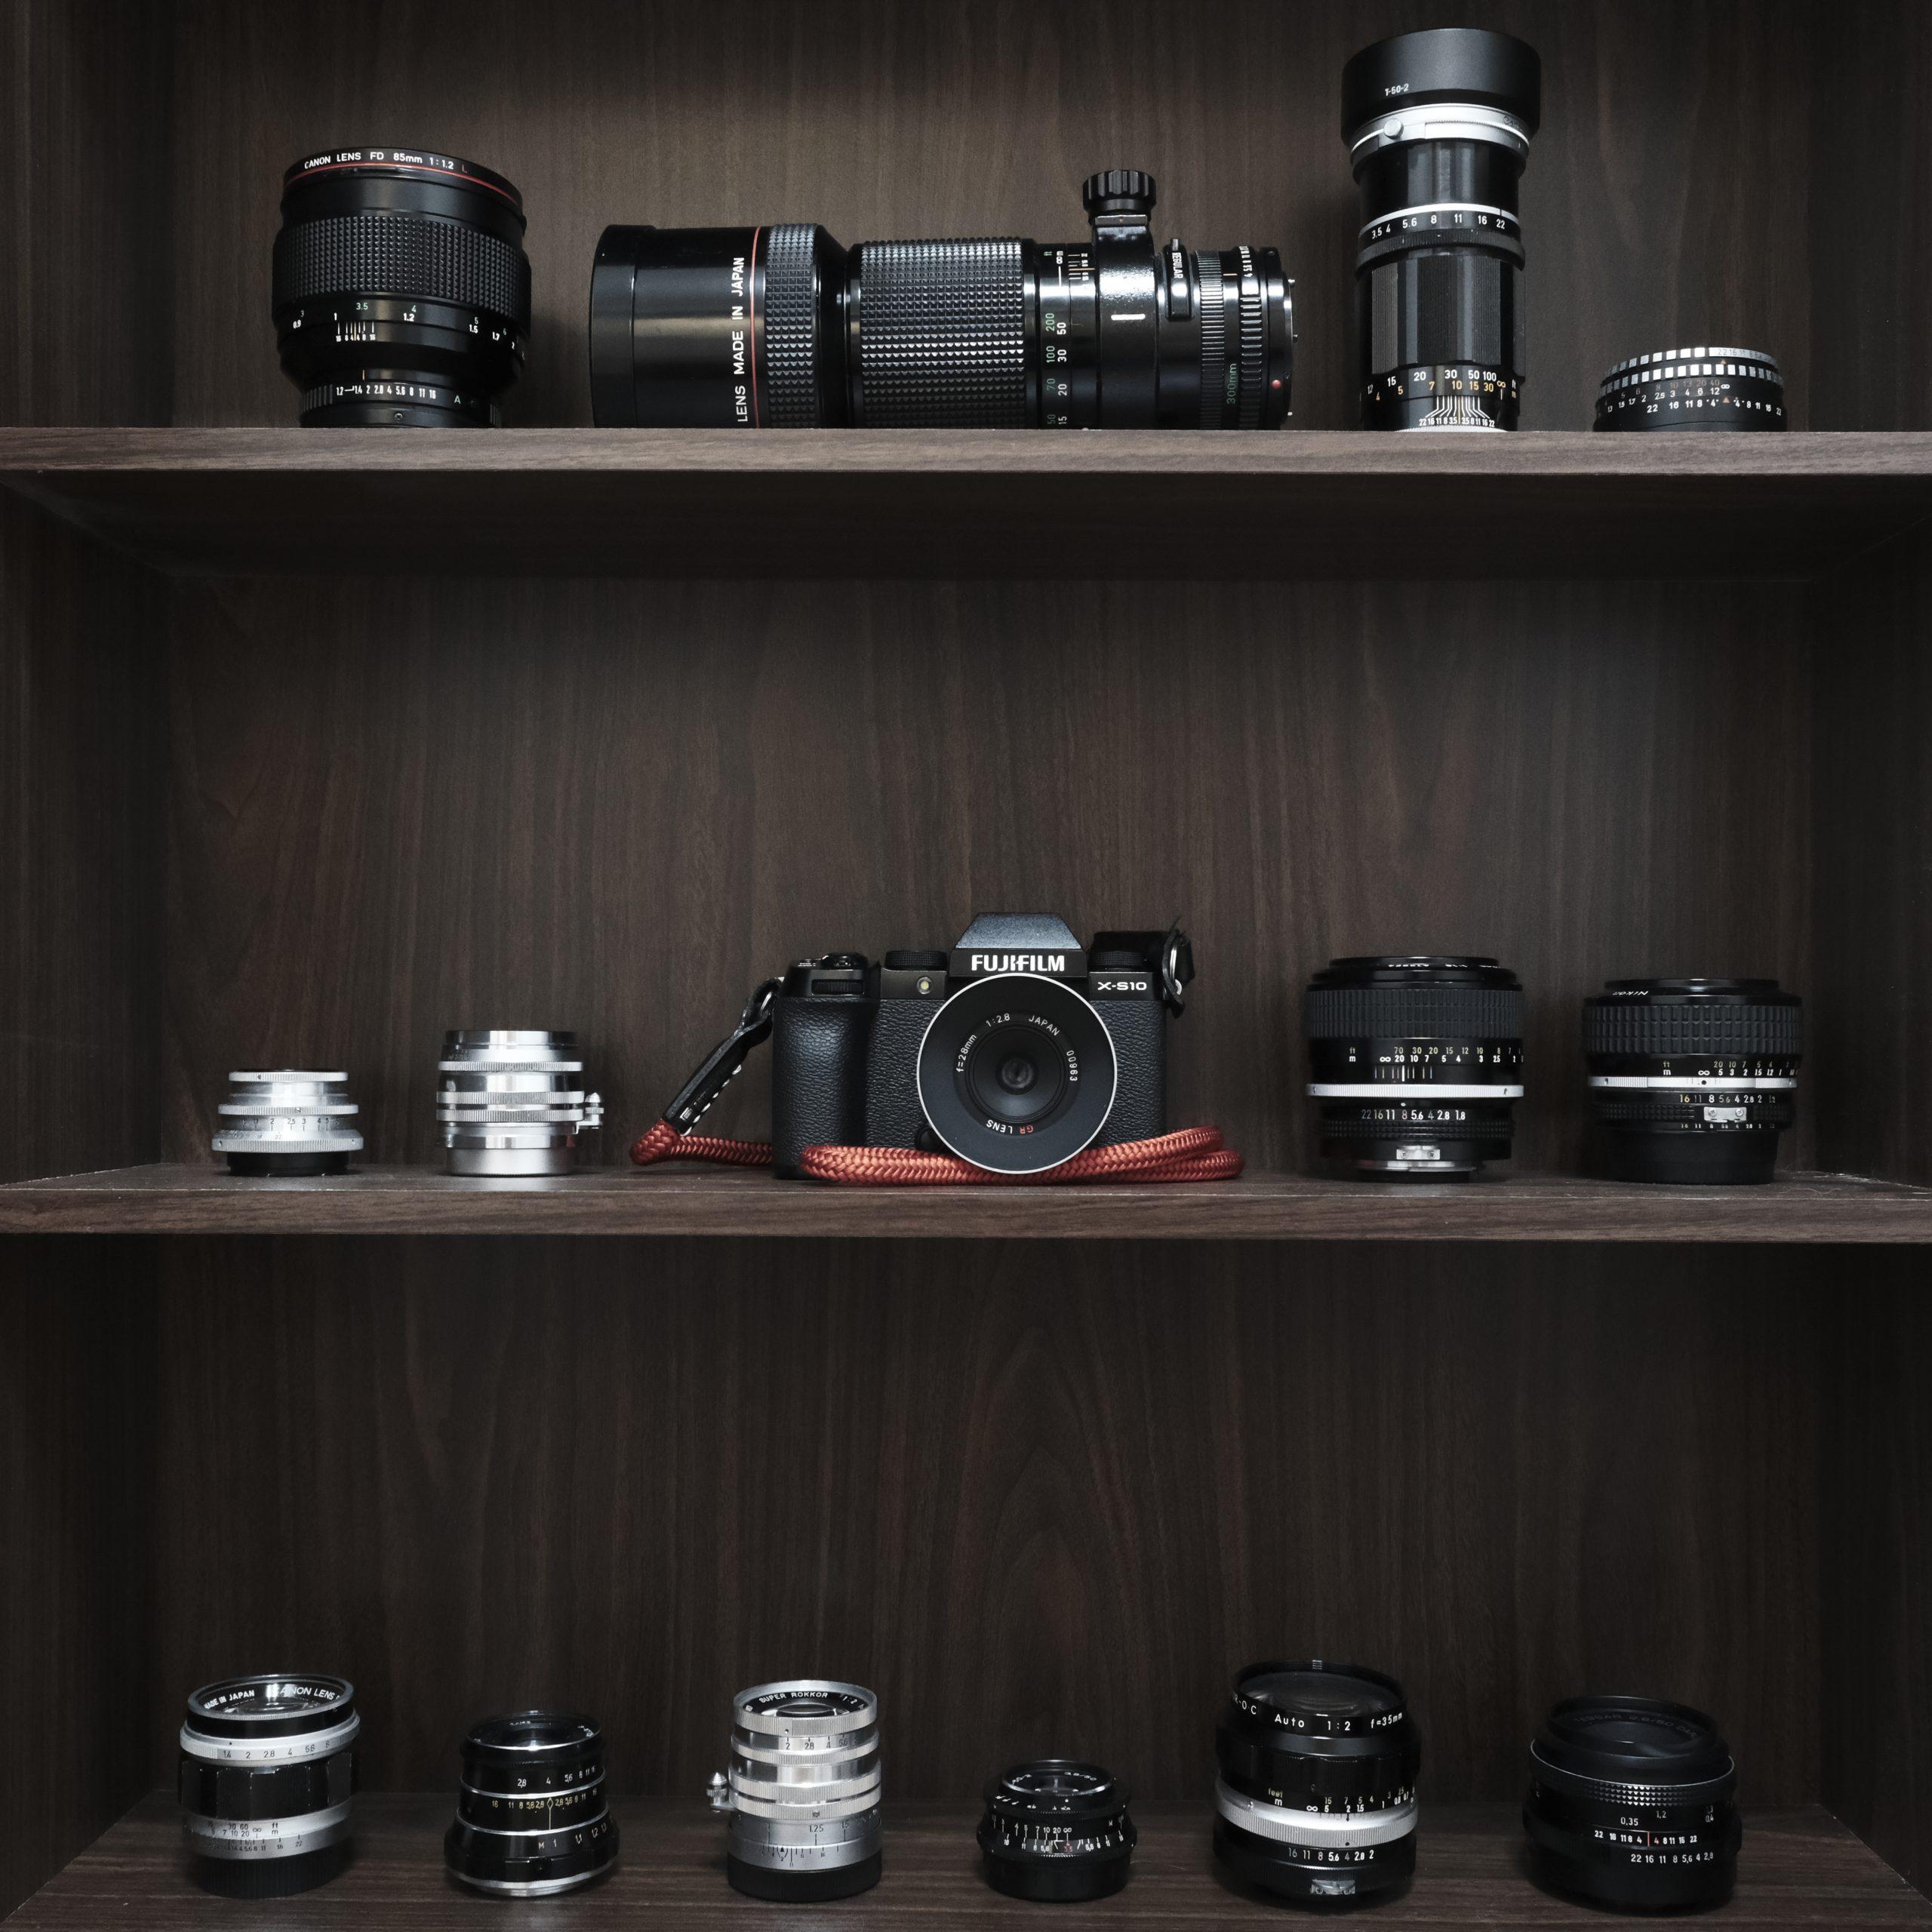 【FUJIFILM】X-S10とオールドレンズ Vol1  RICOH GR 28mm f2.8 L